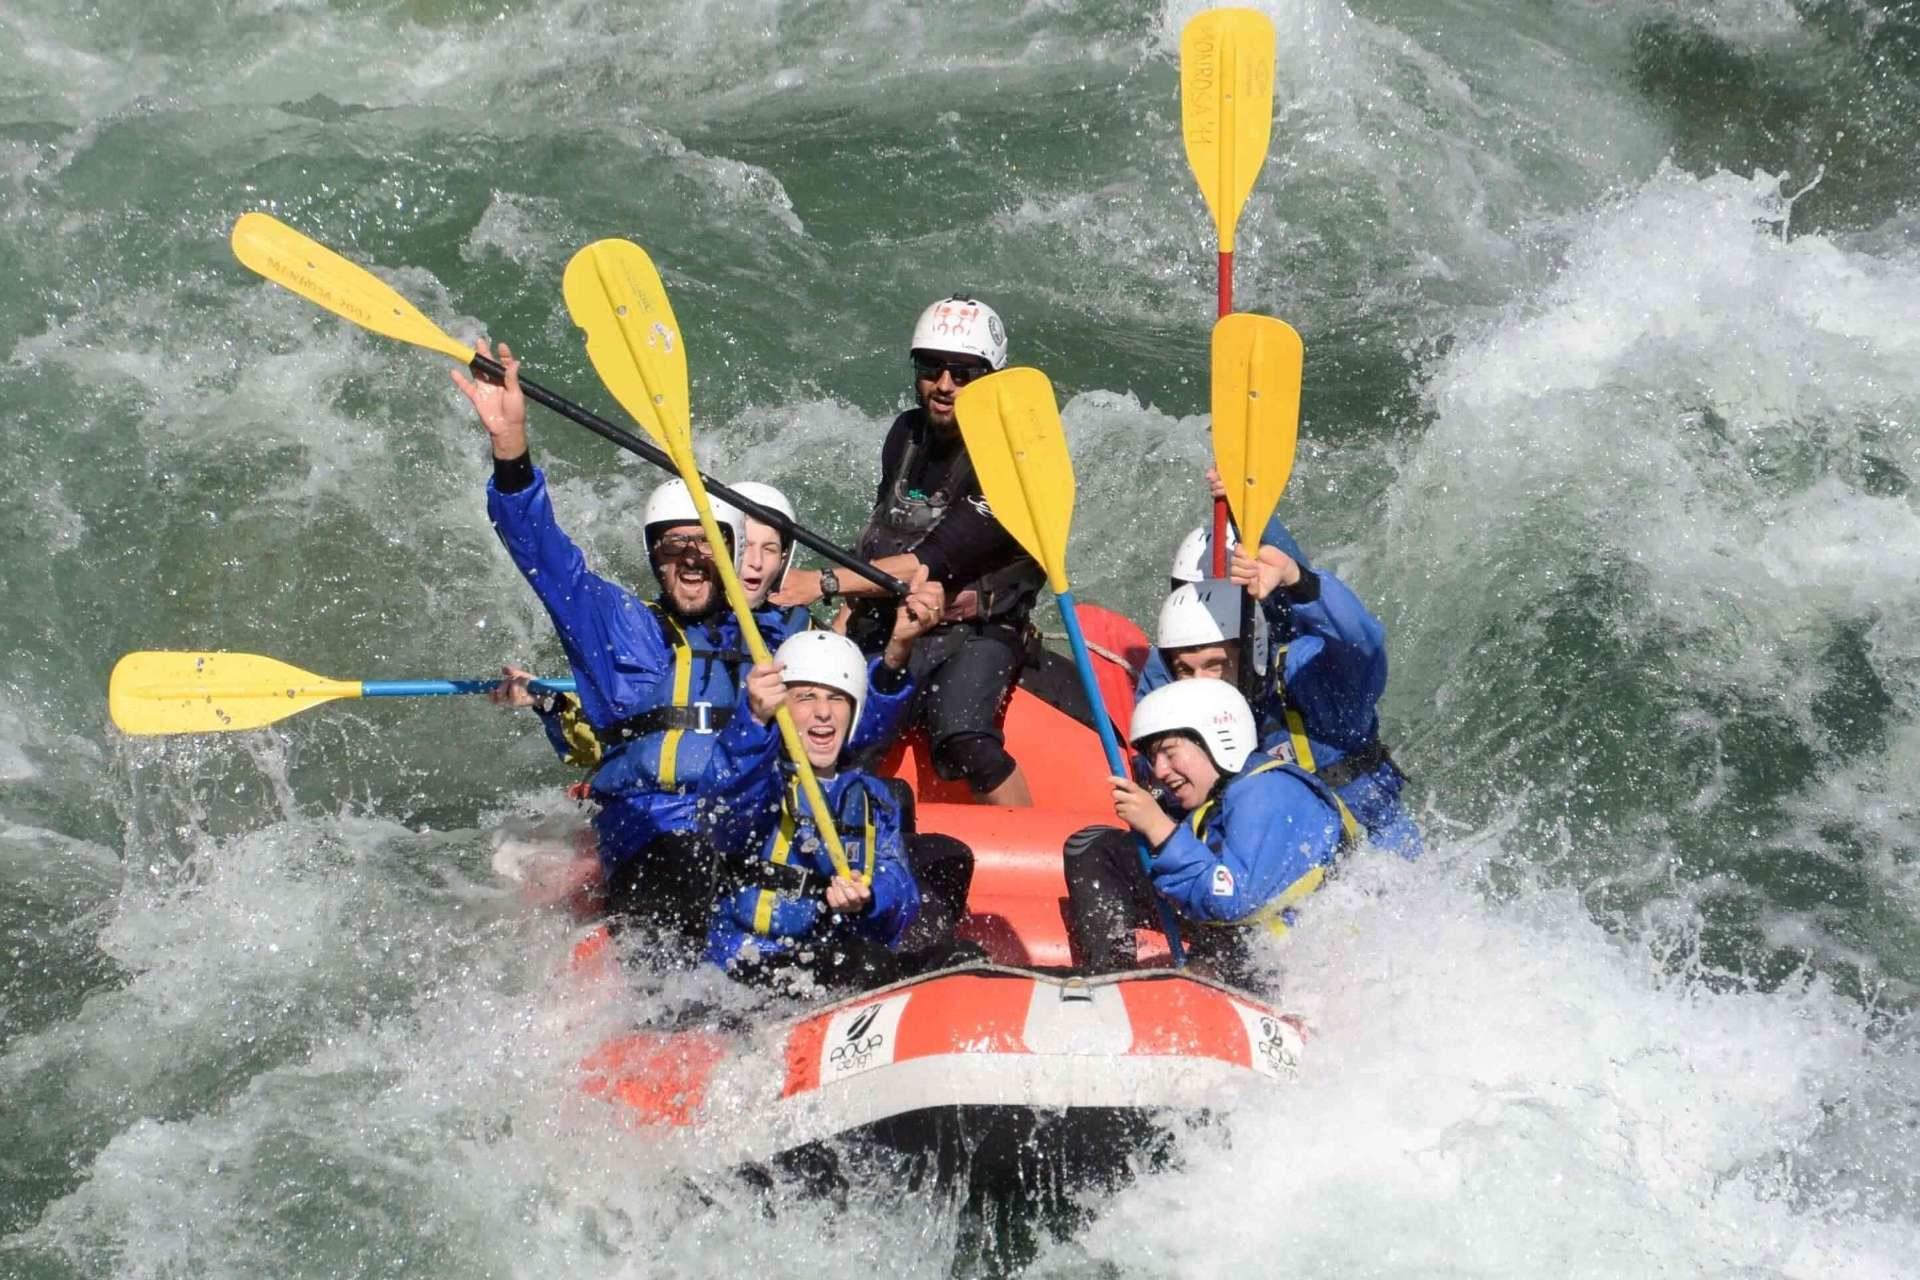 Rafting Piemonte